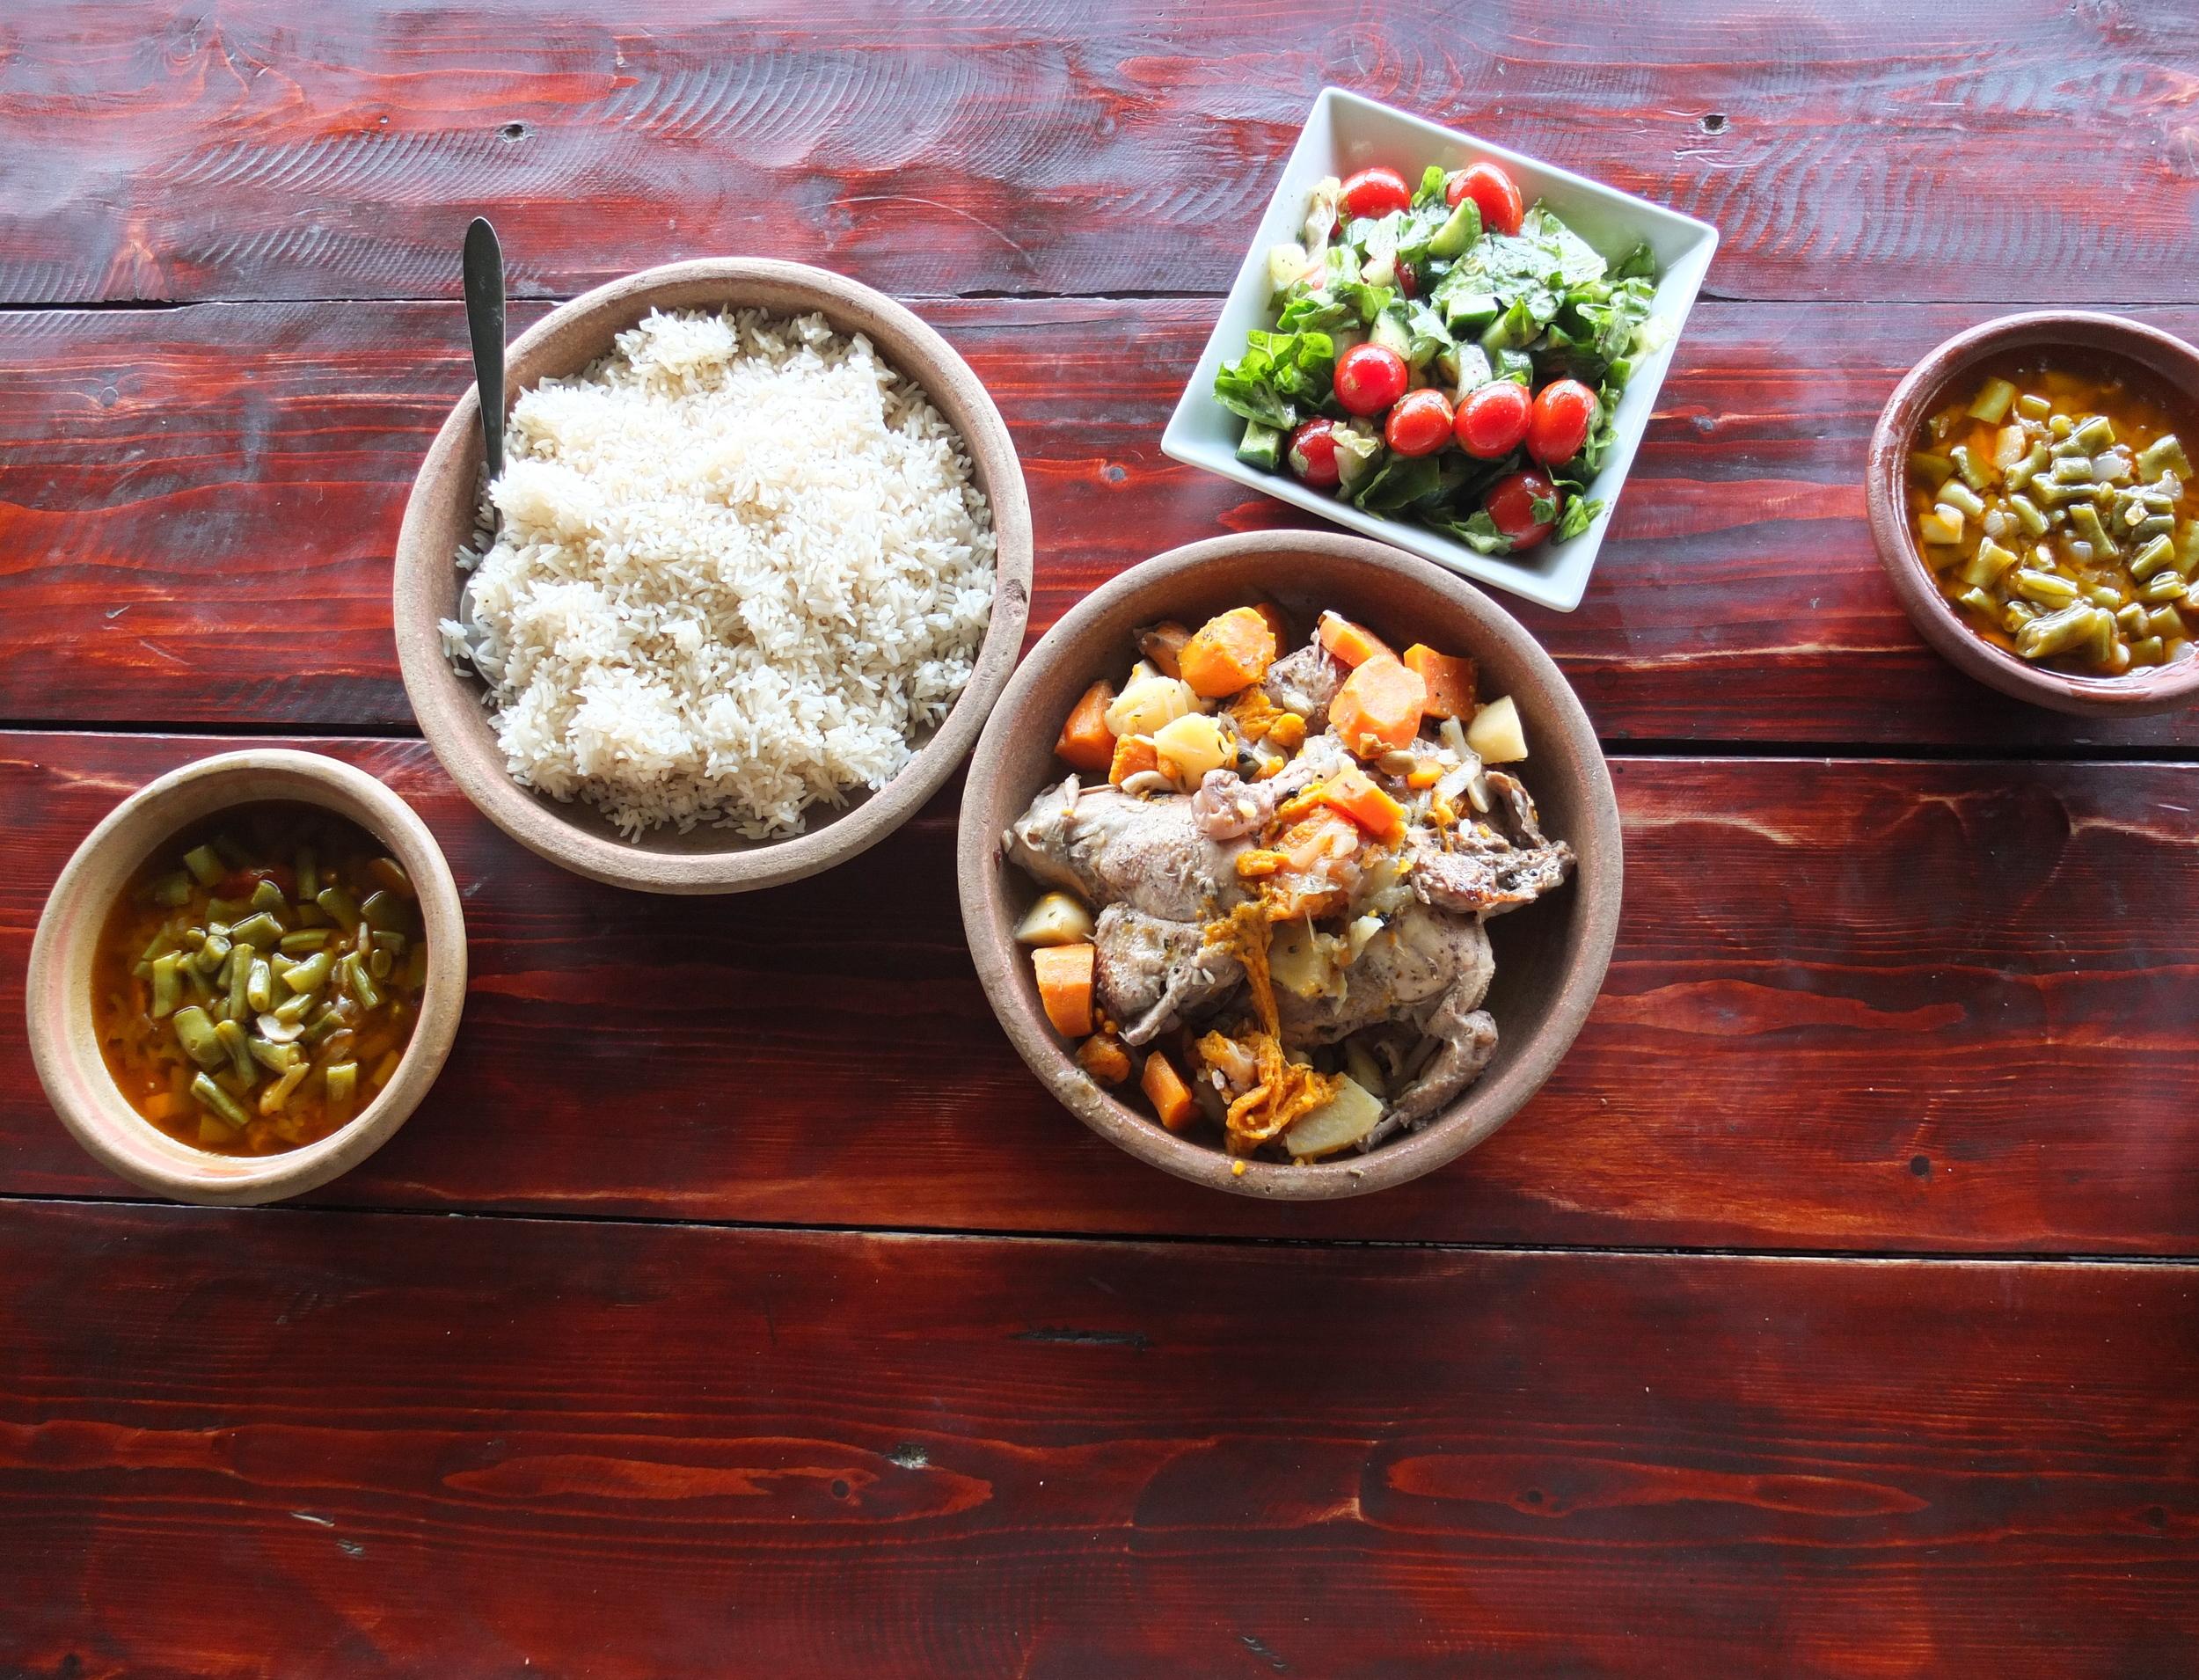 VICE Munchies, 7/16/14  Assorted Dishes  (Hosh Jasmin, Beit Jala, Palestine)